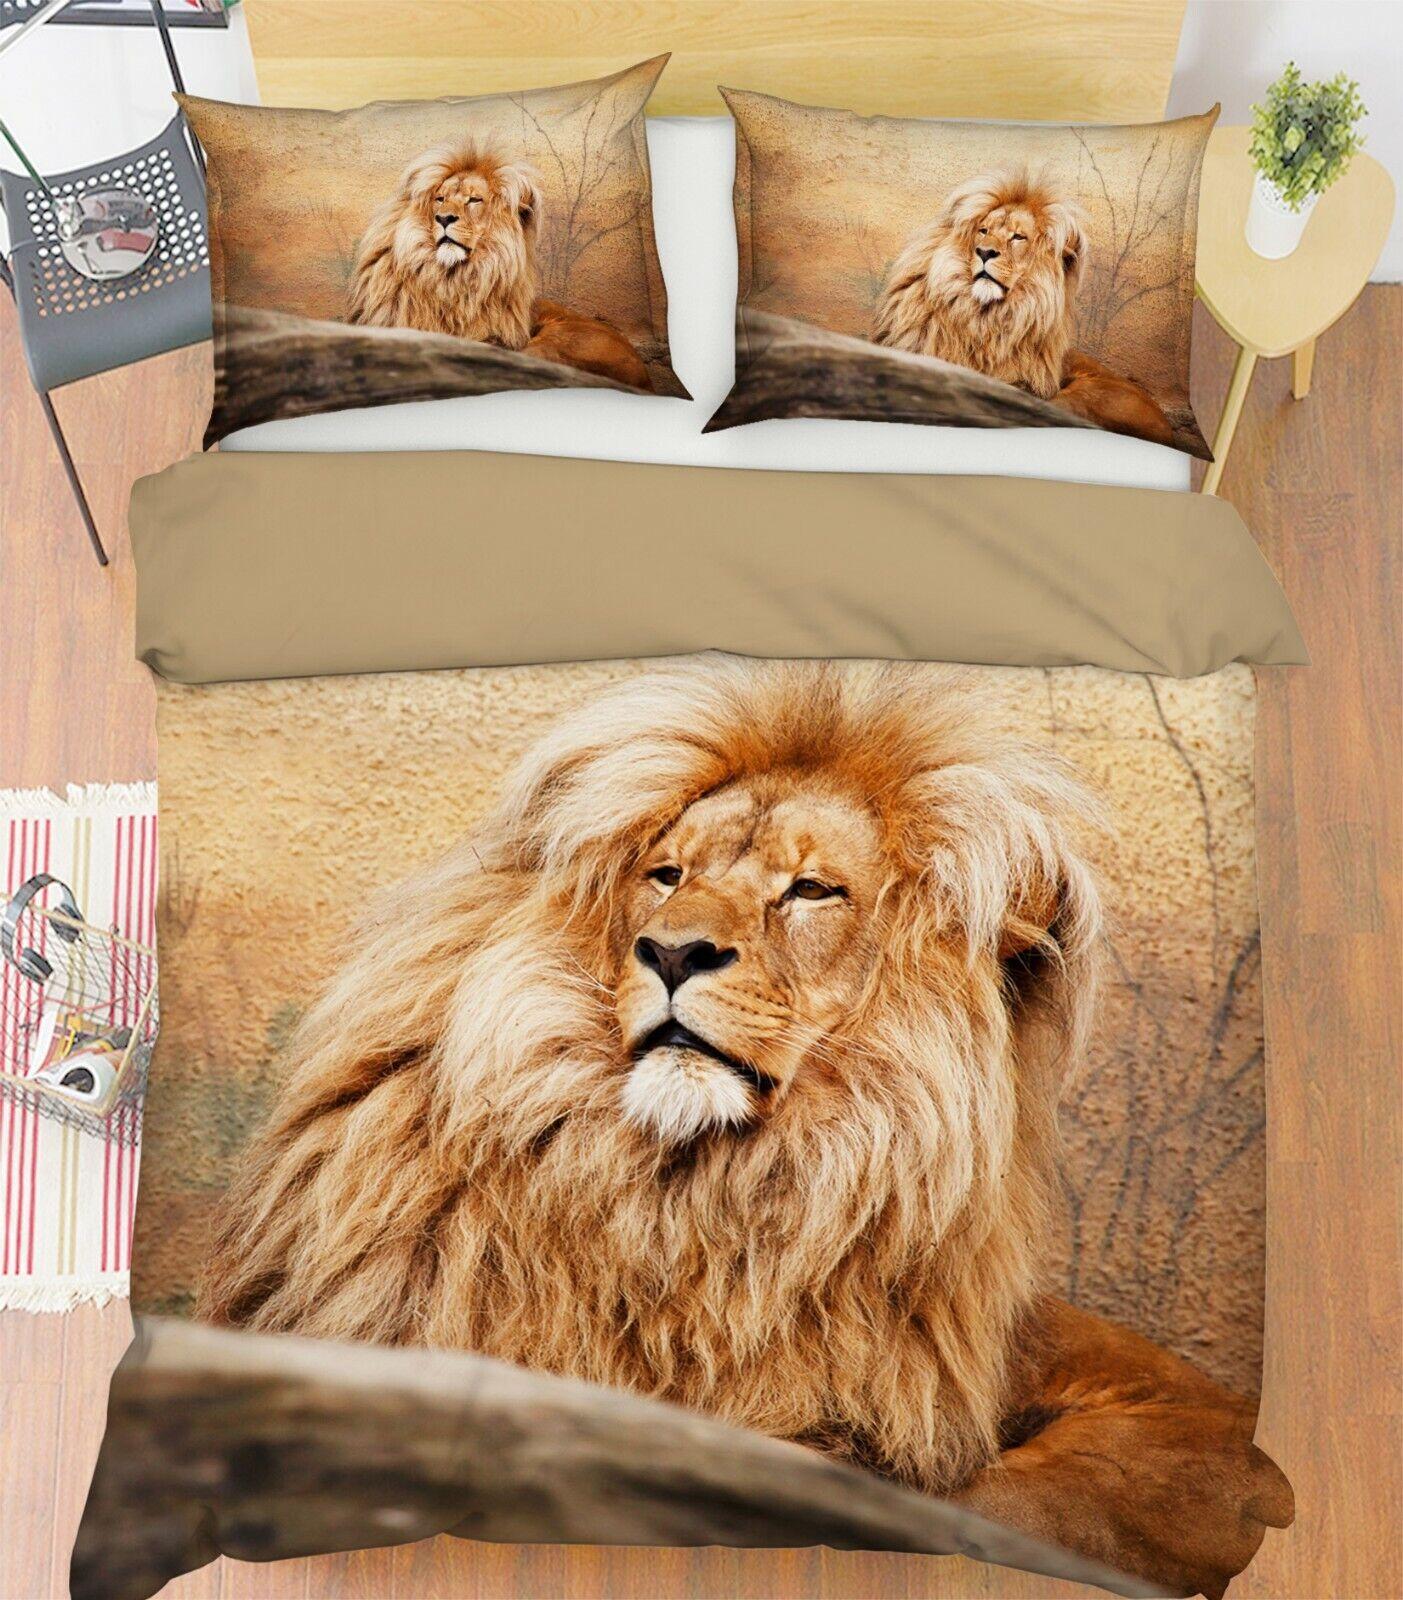 3D Africa Lion P60 Animal Bed Pillowcases Quilt Duvet Cover Set Queen King Zoe